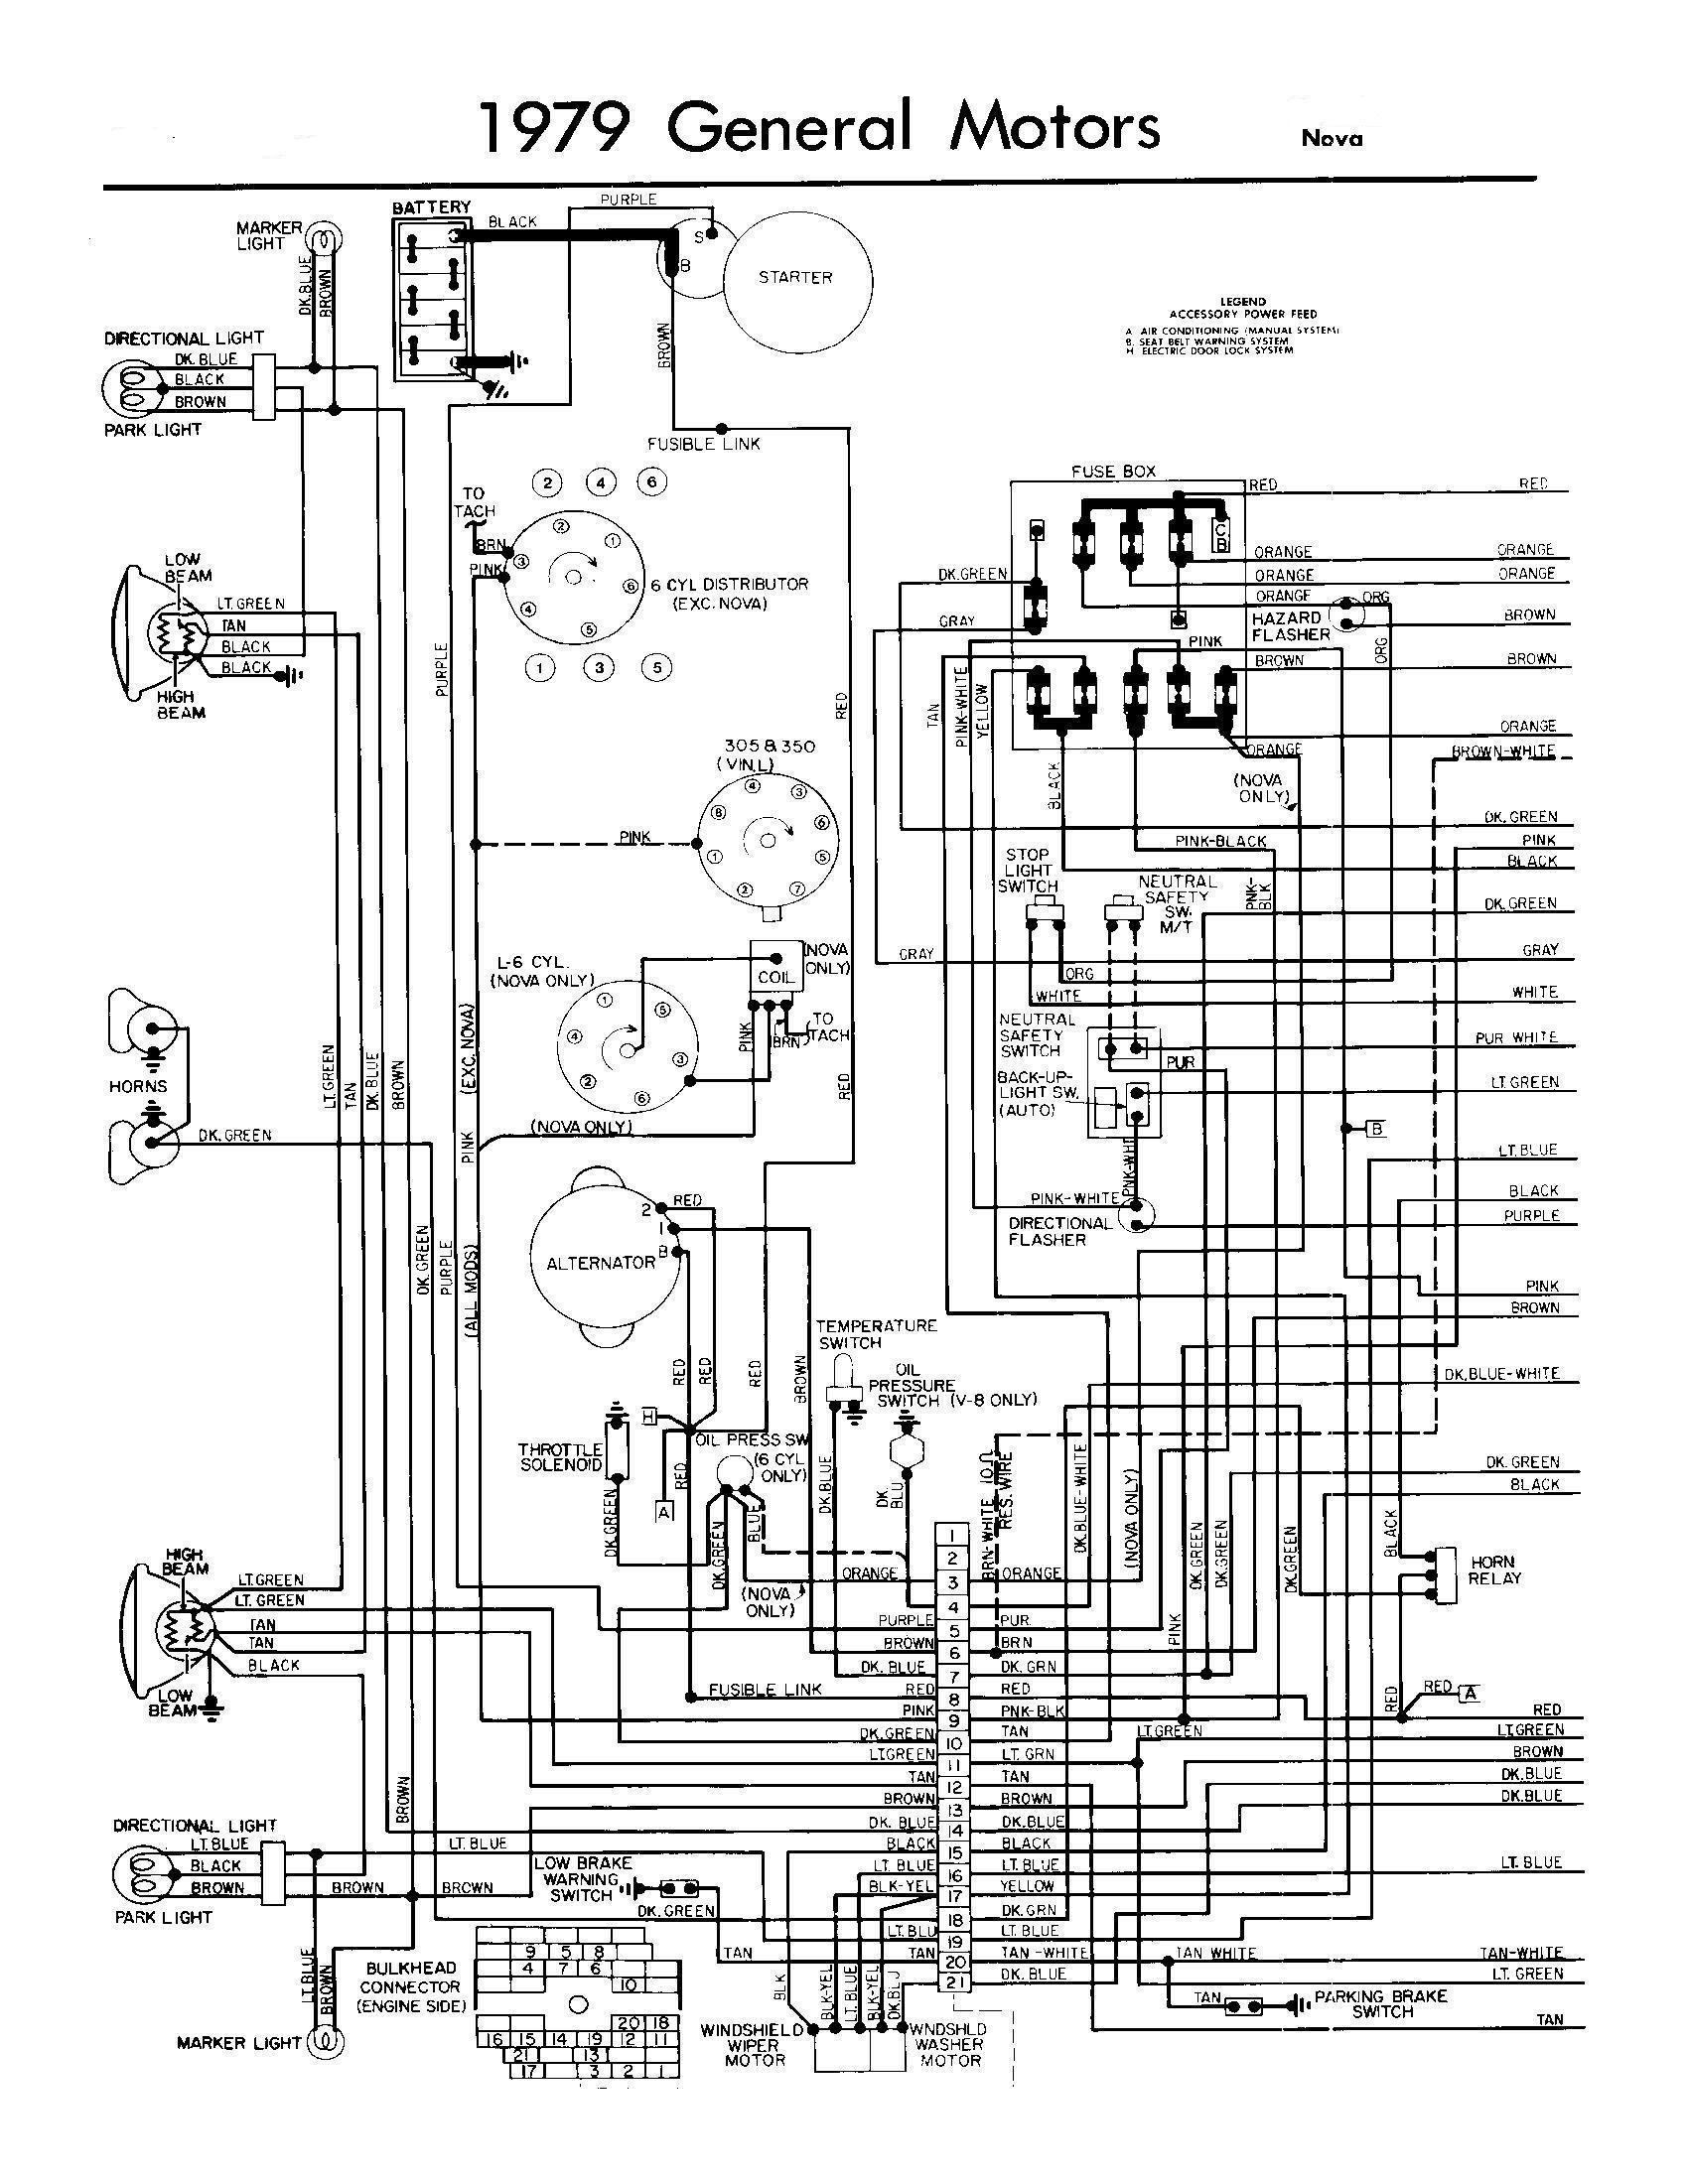 Sterling Wiring Diagram 2002 Fan Clutch Worksheet And 2004 Trailblazer Lt9500 1996 Trusted Rh Dafpods Co Connector Pontiac